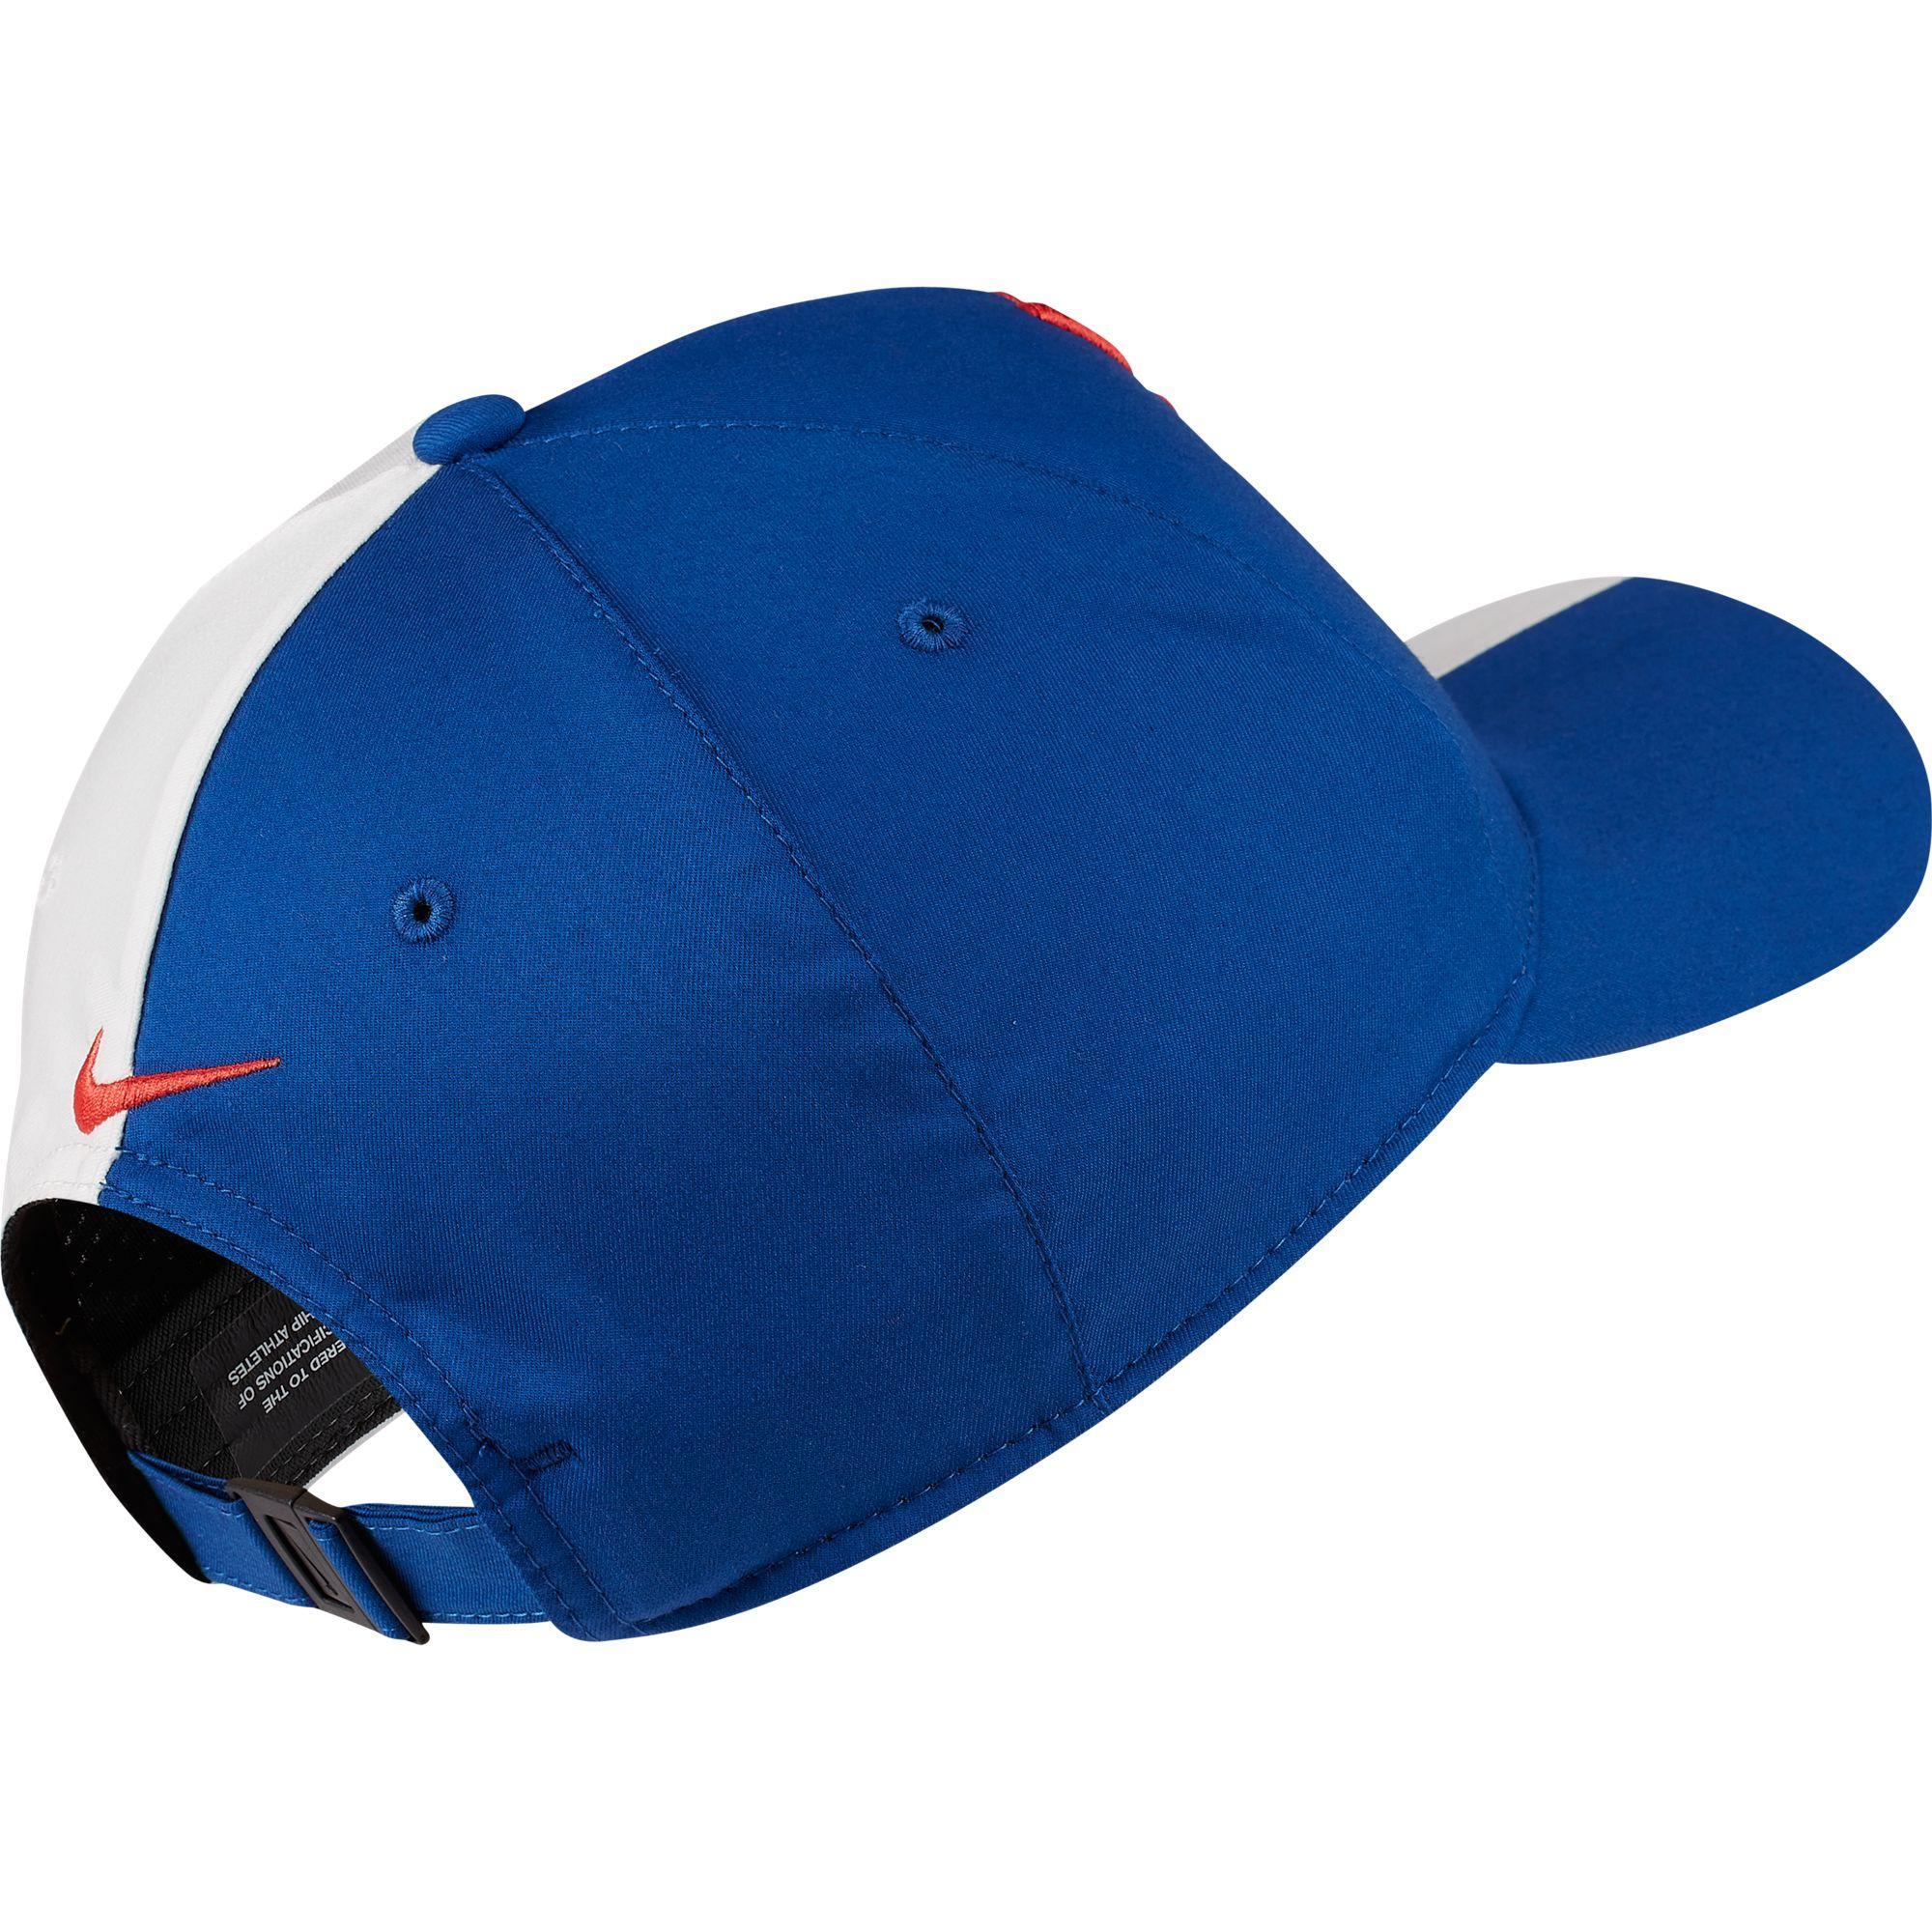 63e79348132 Nike - Blue Aerobill Classic99 Golf Hat for Men - Lyst. View fullscreen